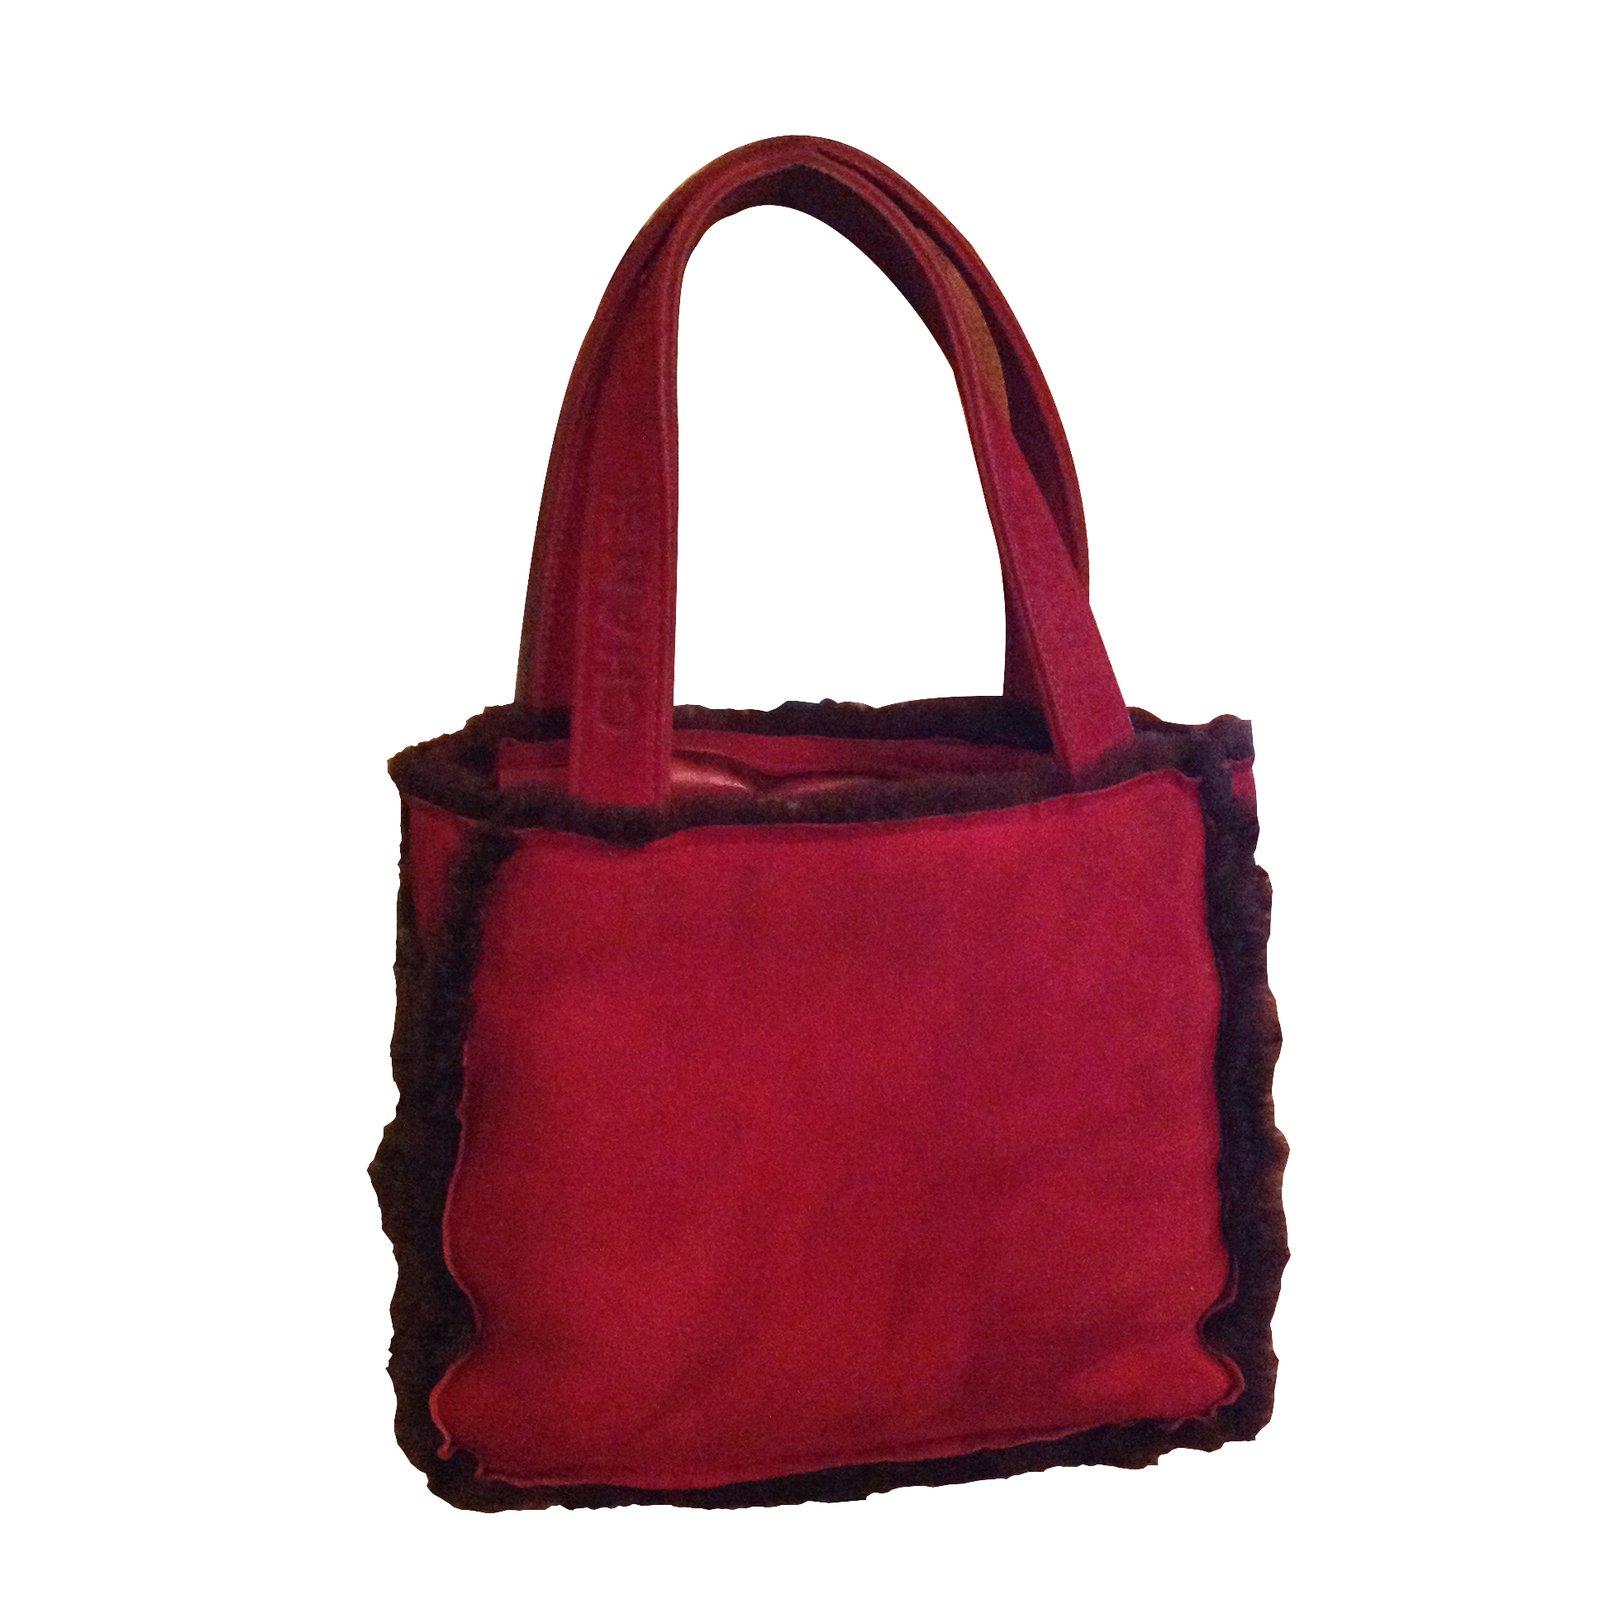 d354bbcb2a3f Chanel Handbags Handbags Lambskin Dark red ref.6468 - Joli Closet